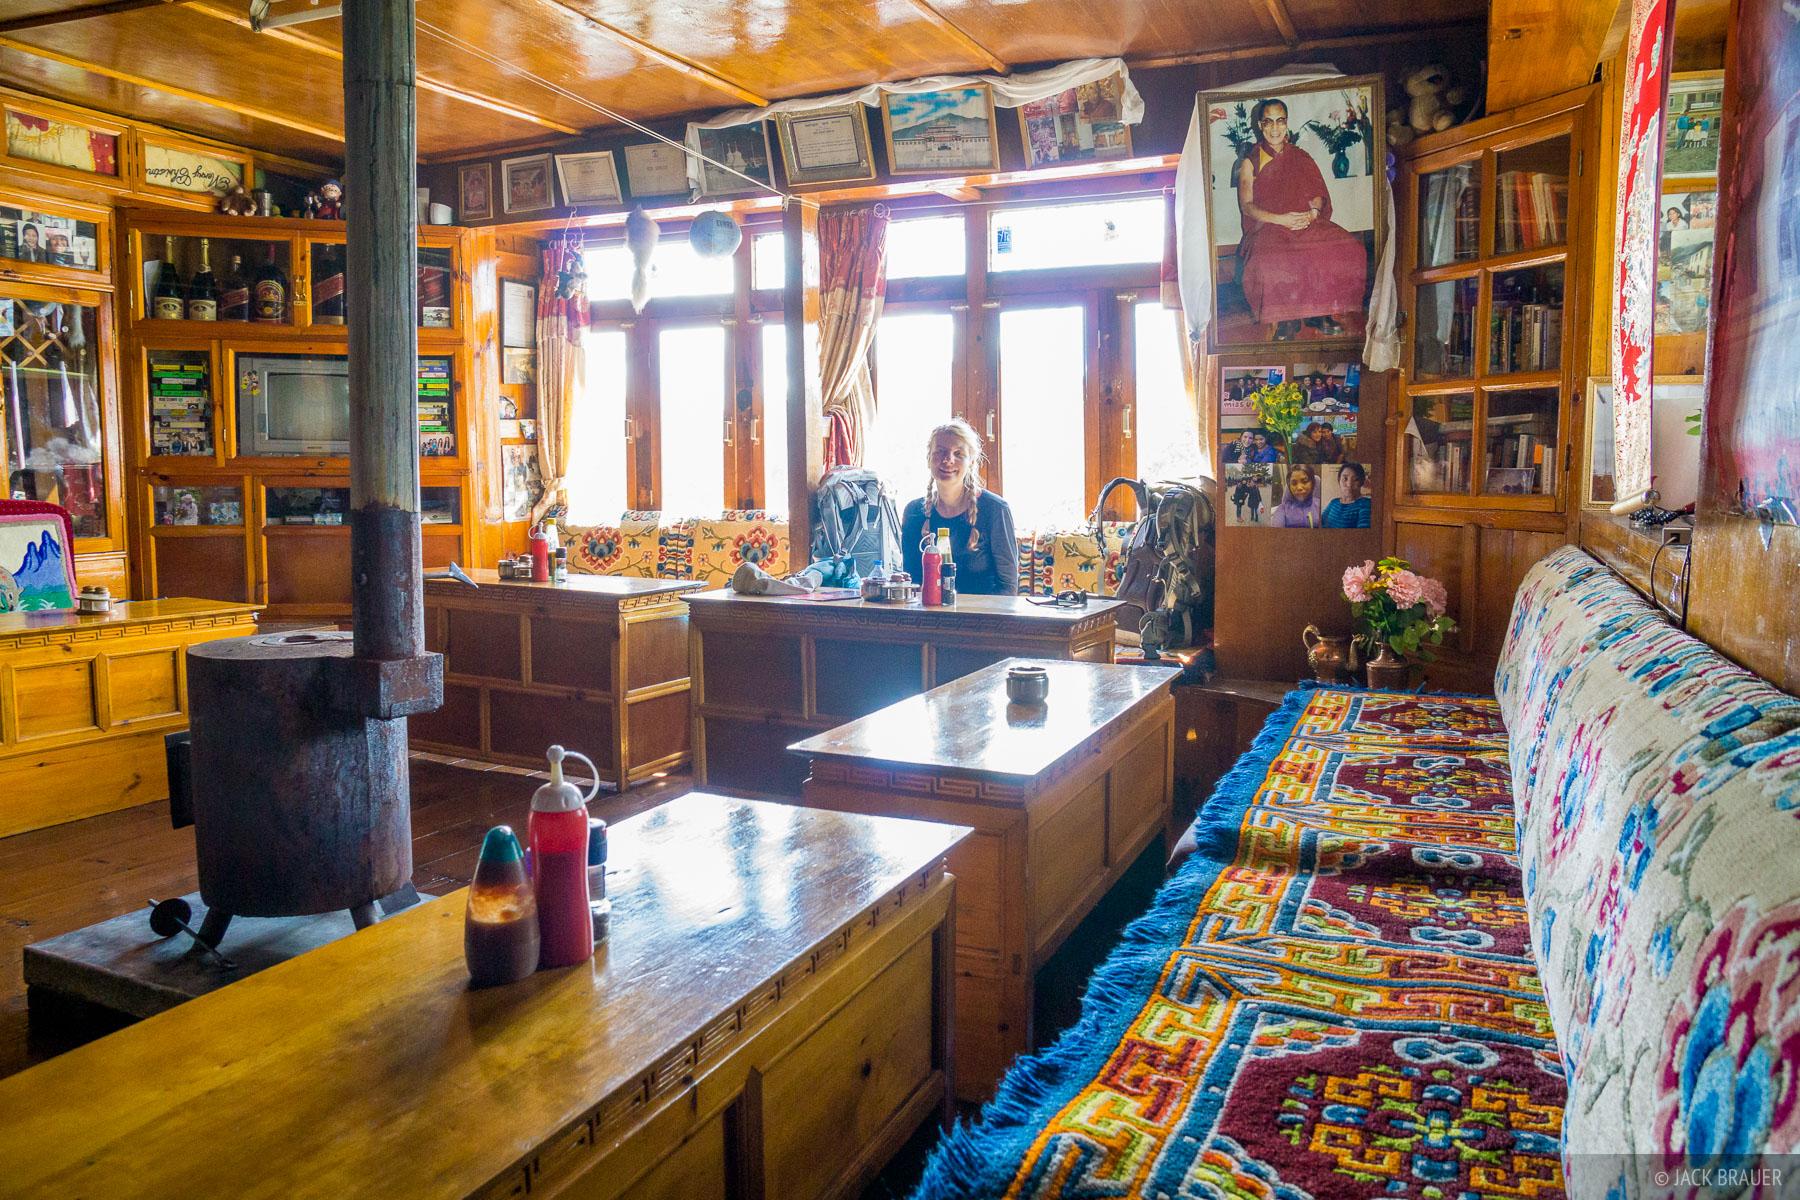 Himalaya,Khumbu,Khumjung,Nepal, teahouse, photo